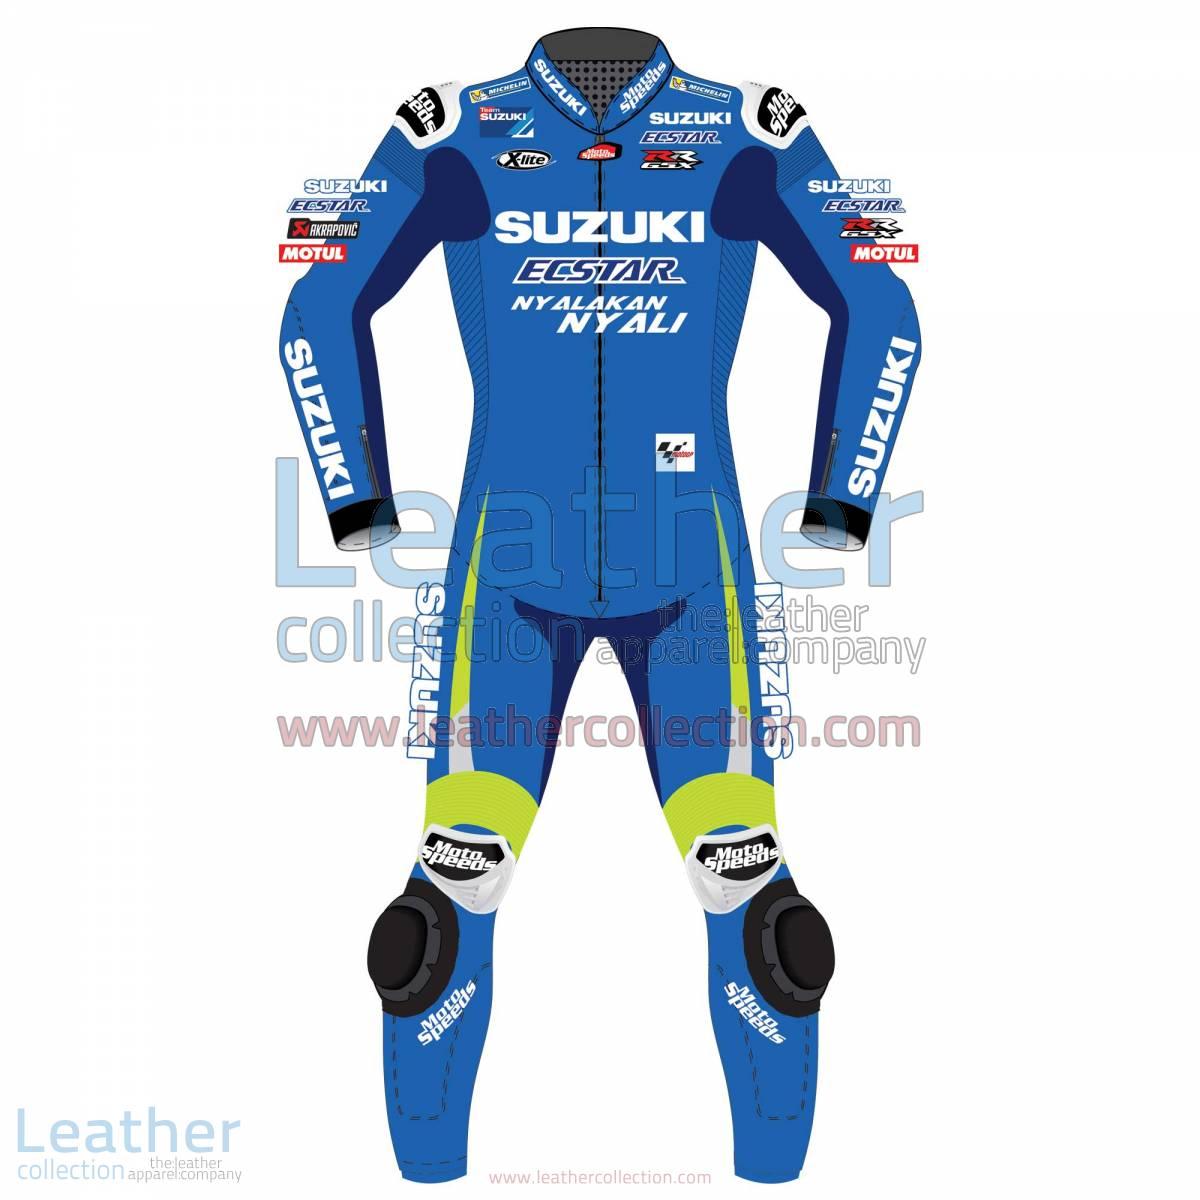 Alex Rins Suzuki MotoGP 2017 Racing Suit